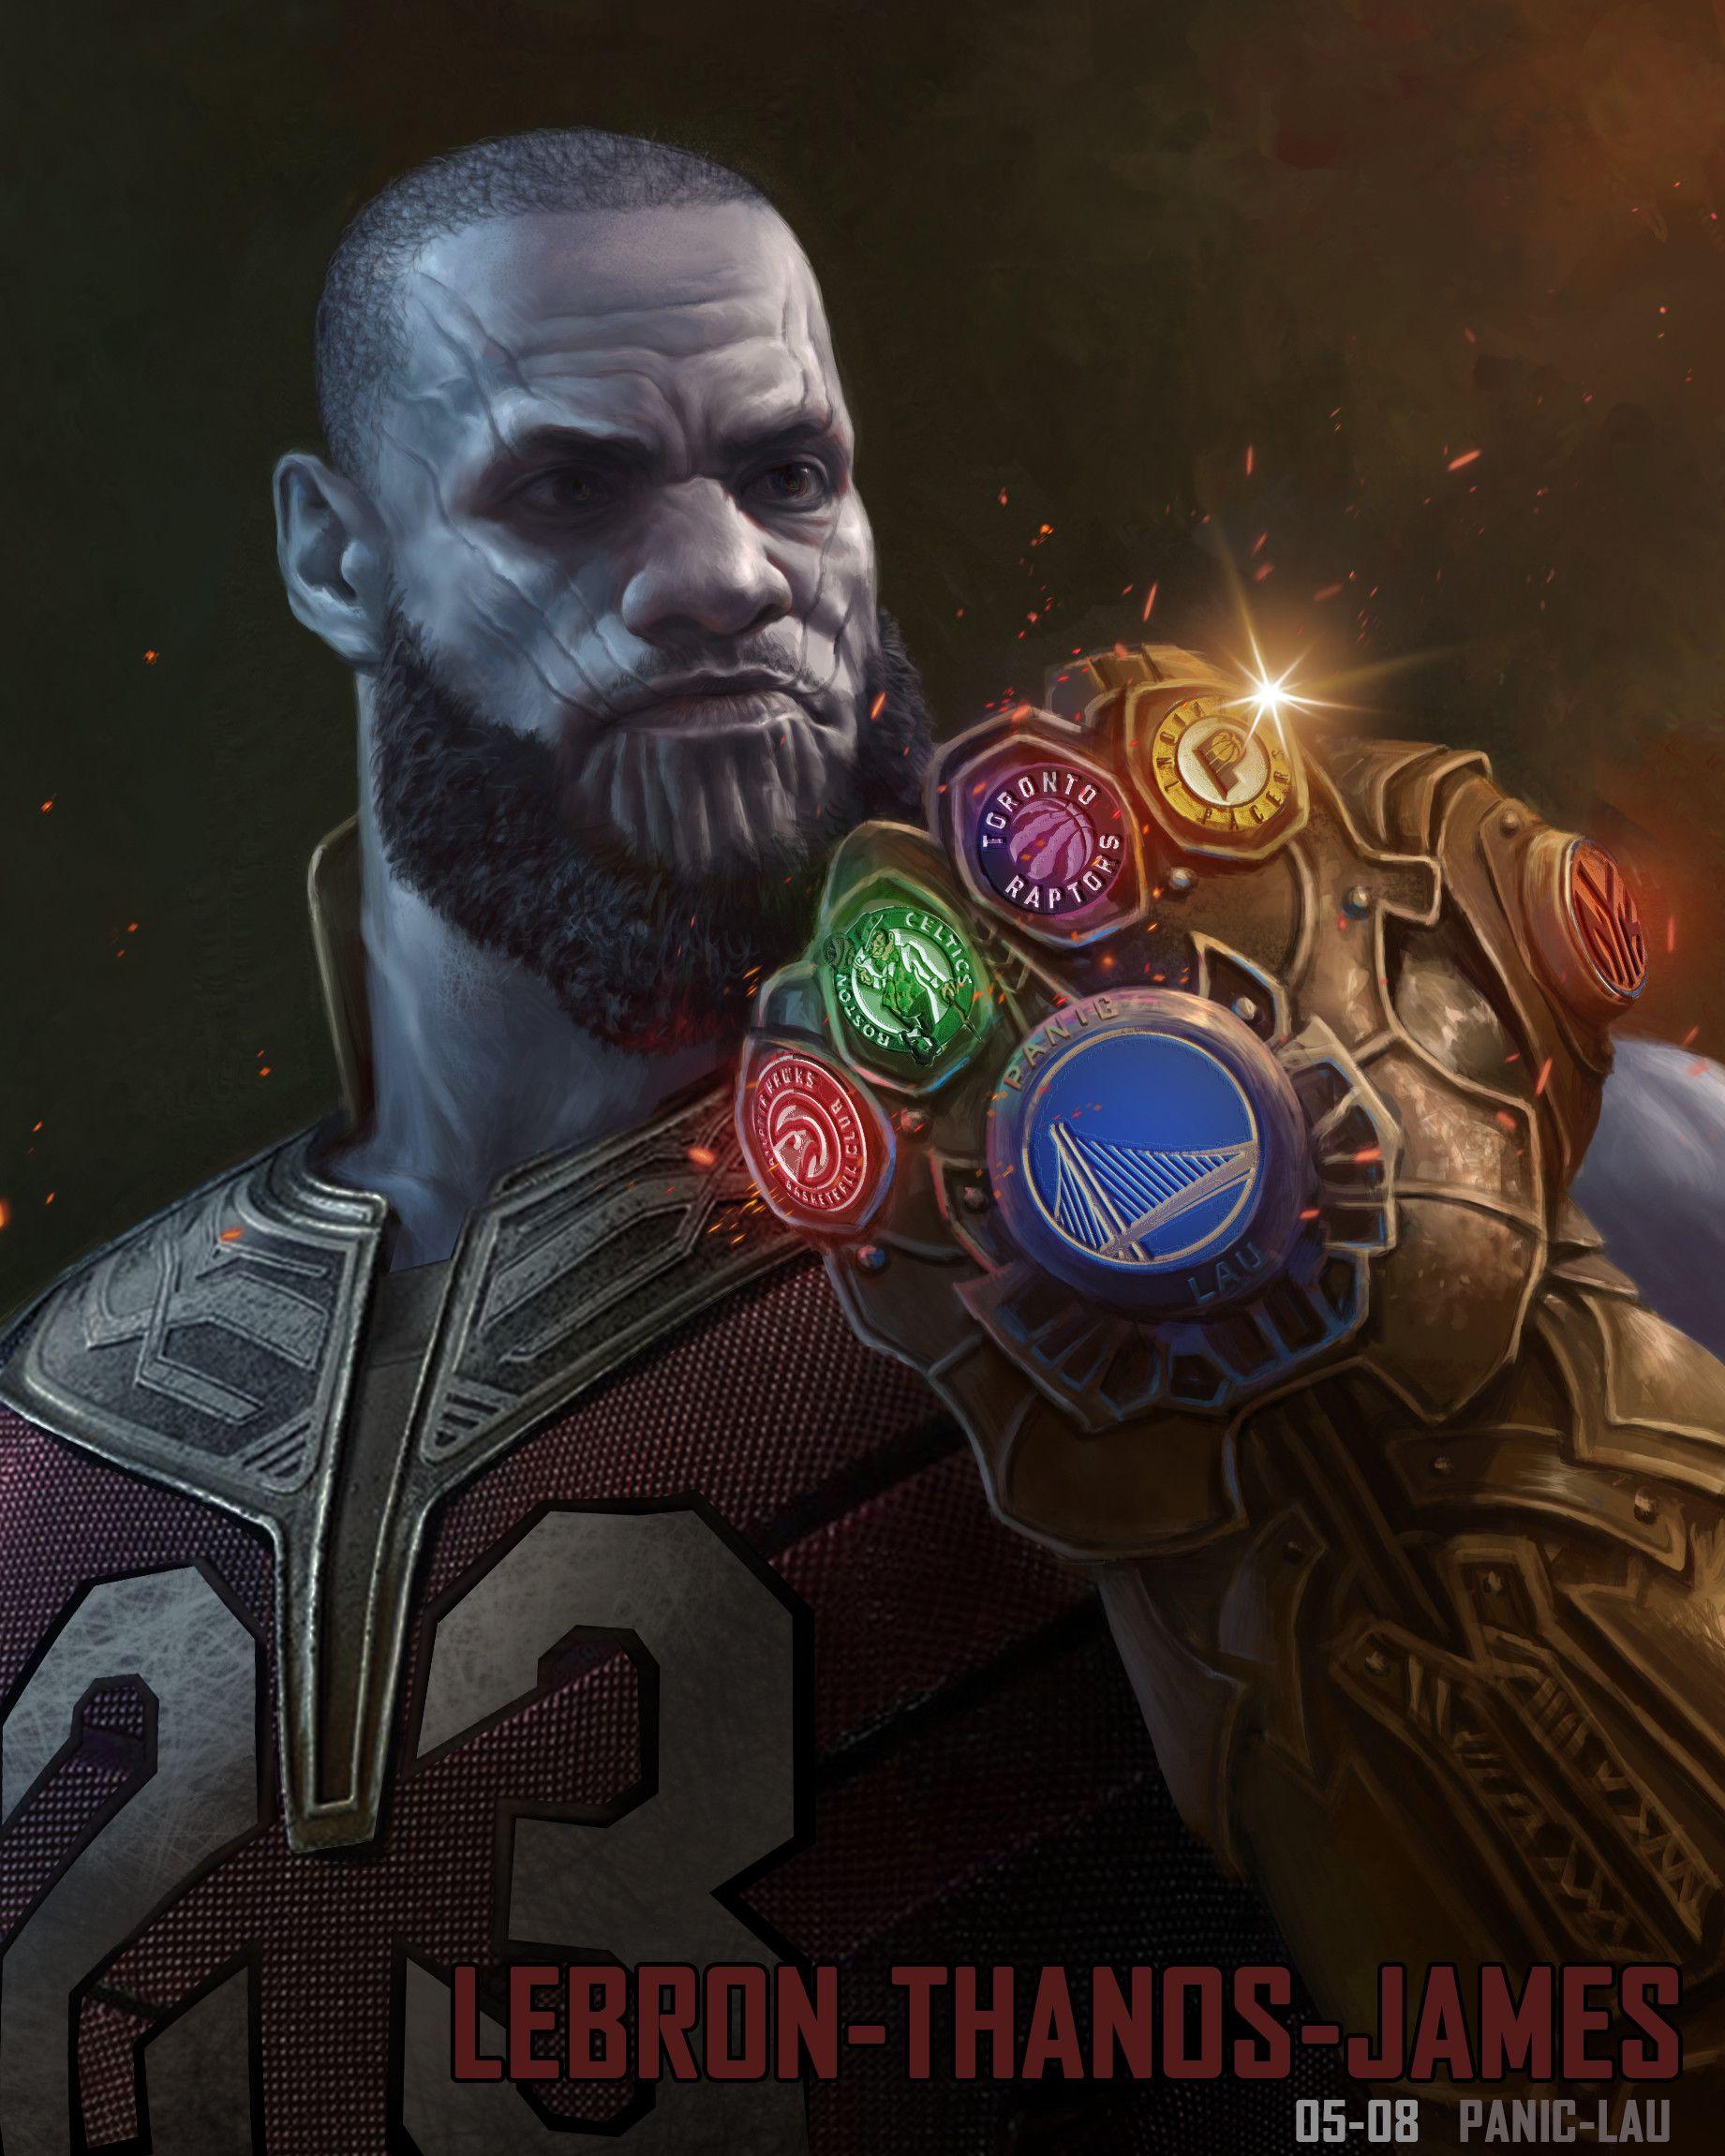 ArtStation - LeBron Thanos James, Panic